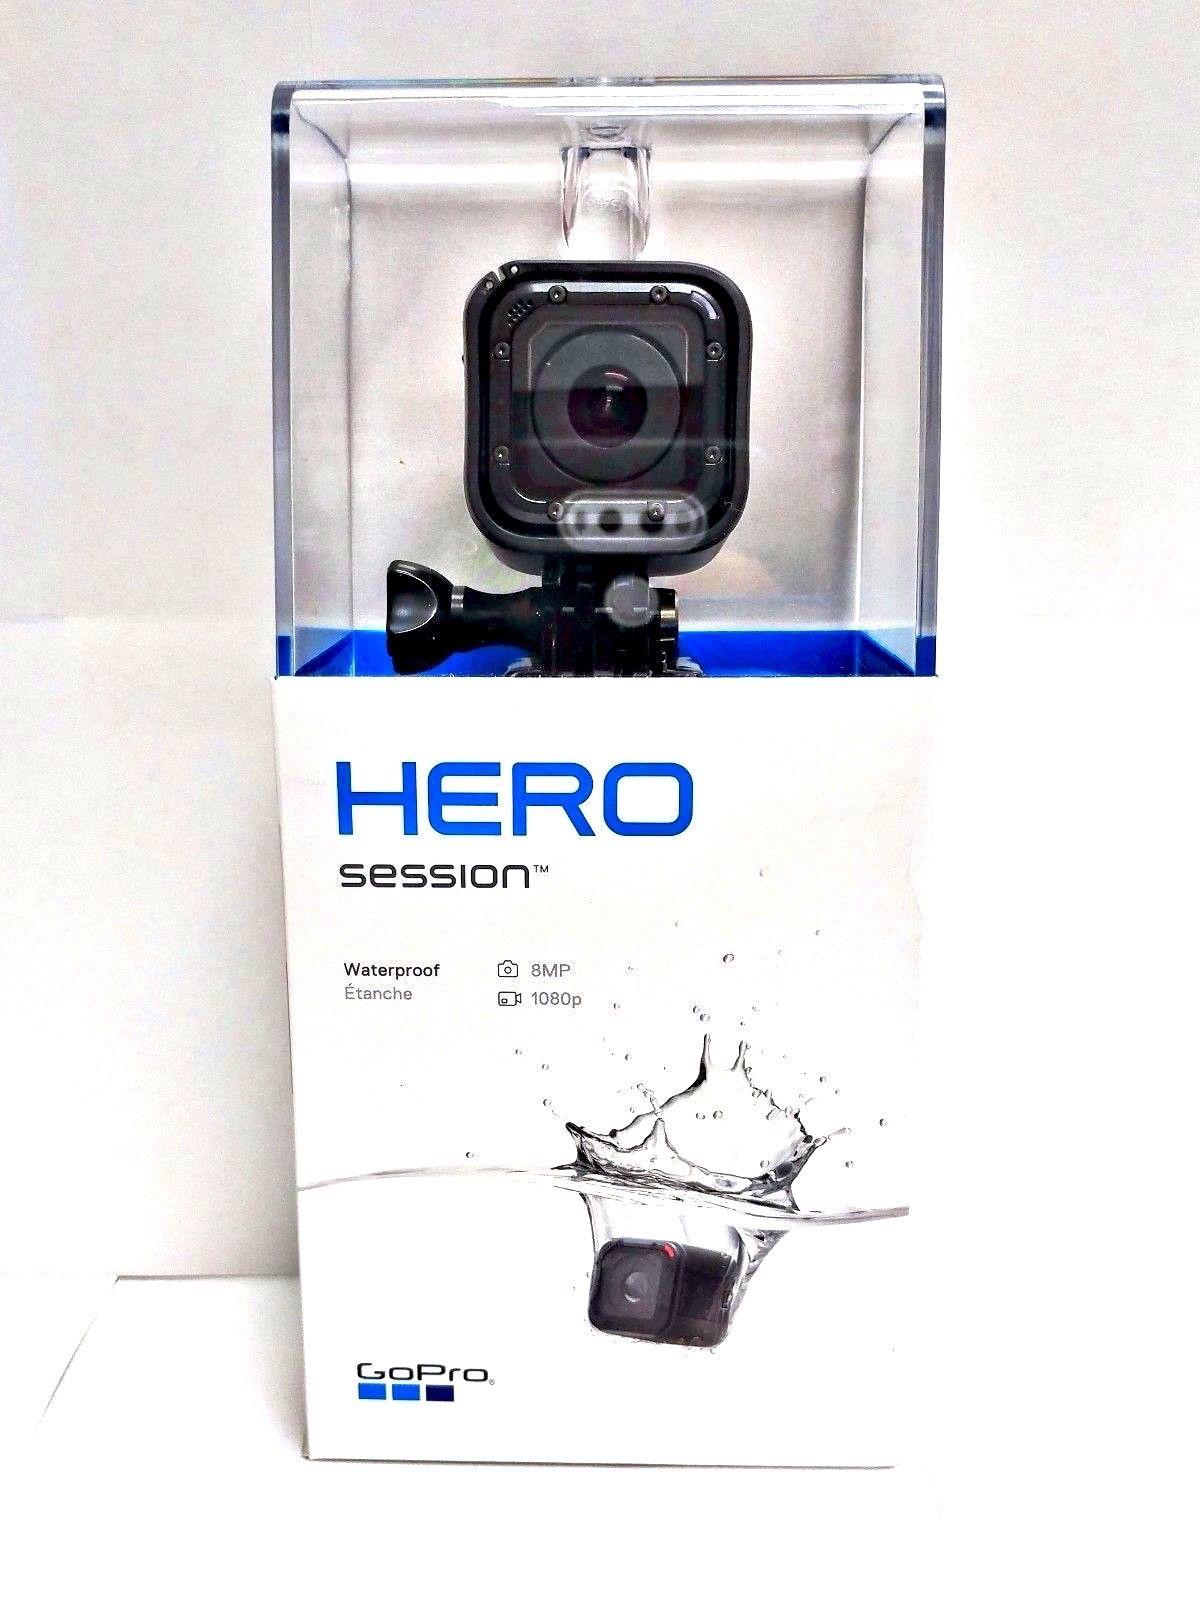 GOPRO HERO Session HD Movement High-def digital camera WiFi Video 1080p Videocamera BRAND NEW